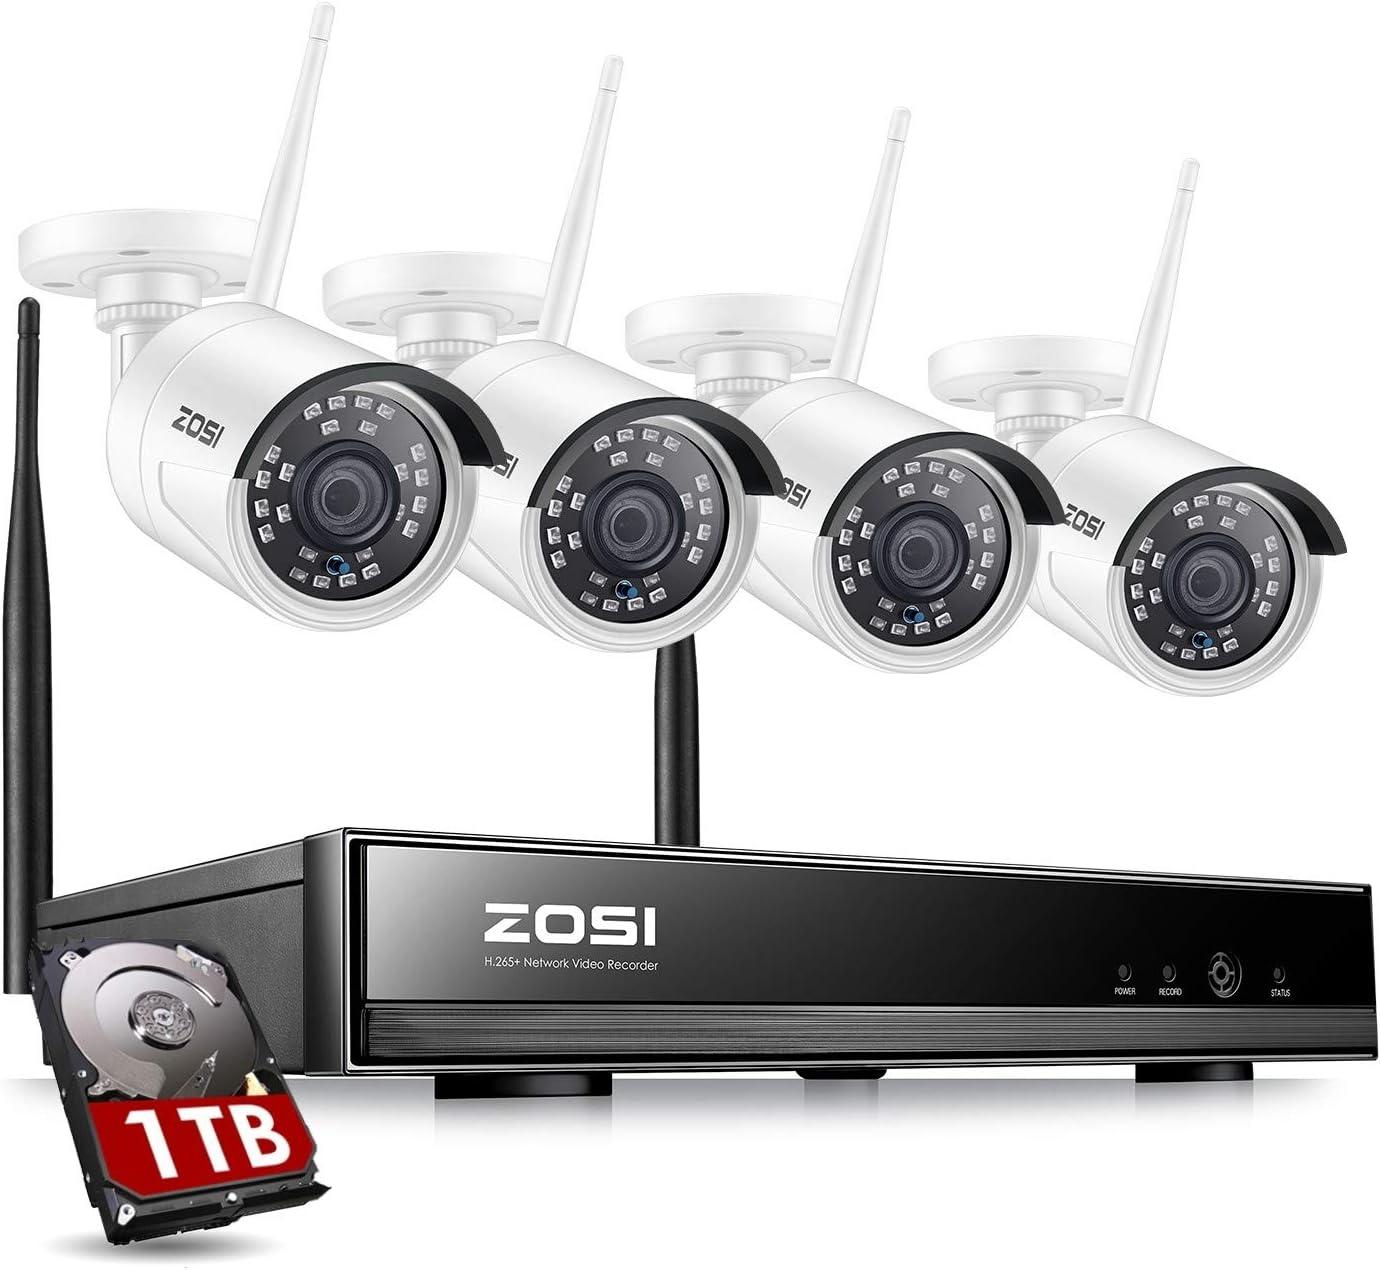 ZOSI Kit de Cámaras Seguridad WiFi 1080P Sistema Vigilancia Inalámbrica 8CH H.265+ NVR con 4pcs Cámaras de Videovigilancia Exterior, IP67 Impermeable, Detección de Movimiento,1TB Disco Duro